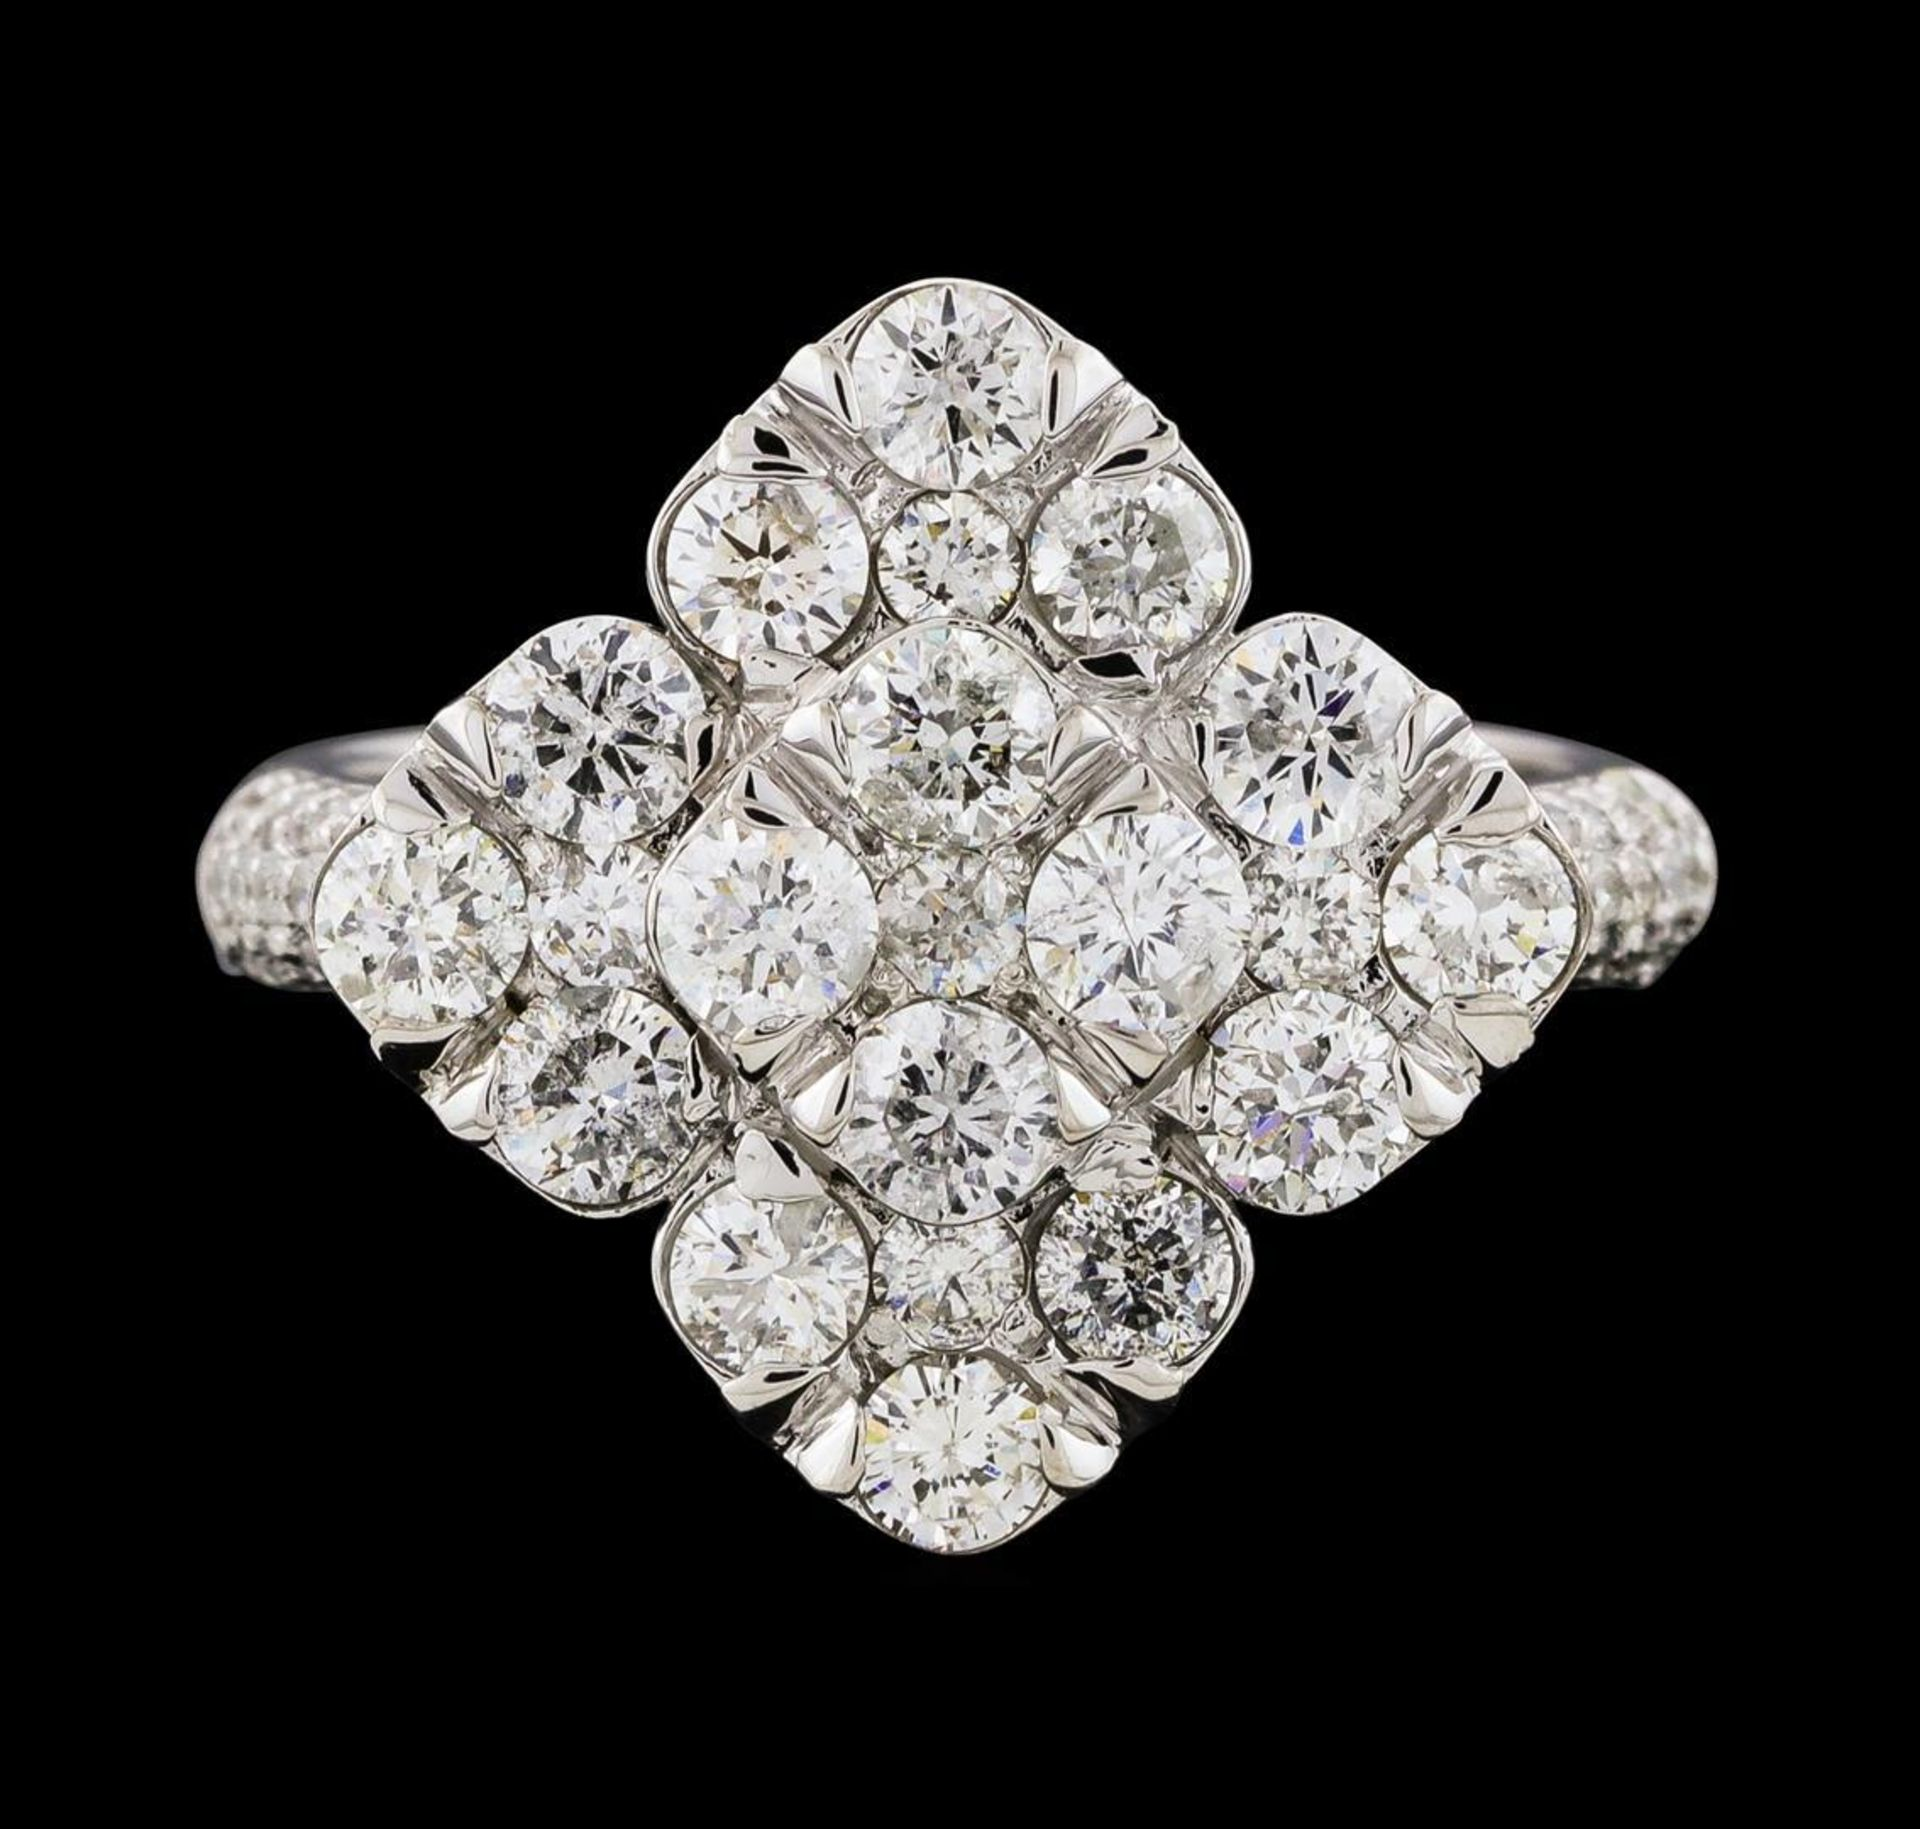 2.12 ctw Diamond Ring - 14KT White Gold - Image 2 of 5